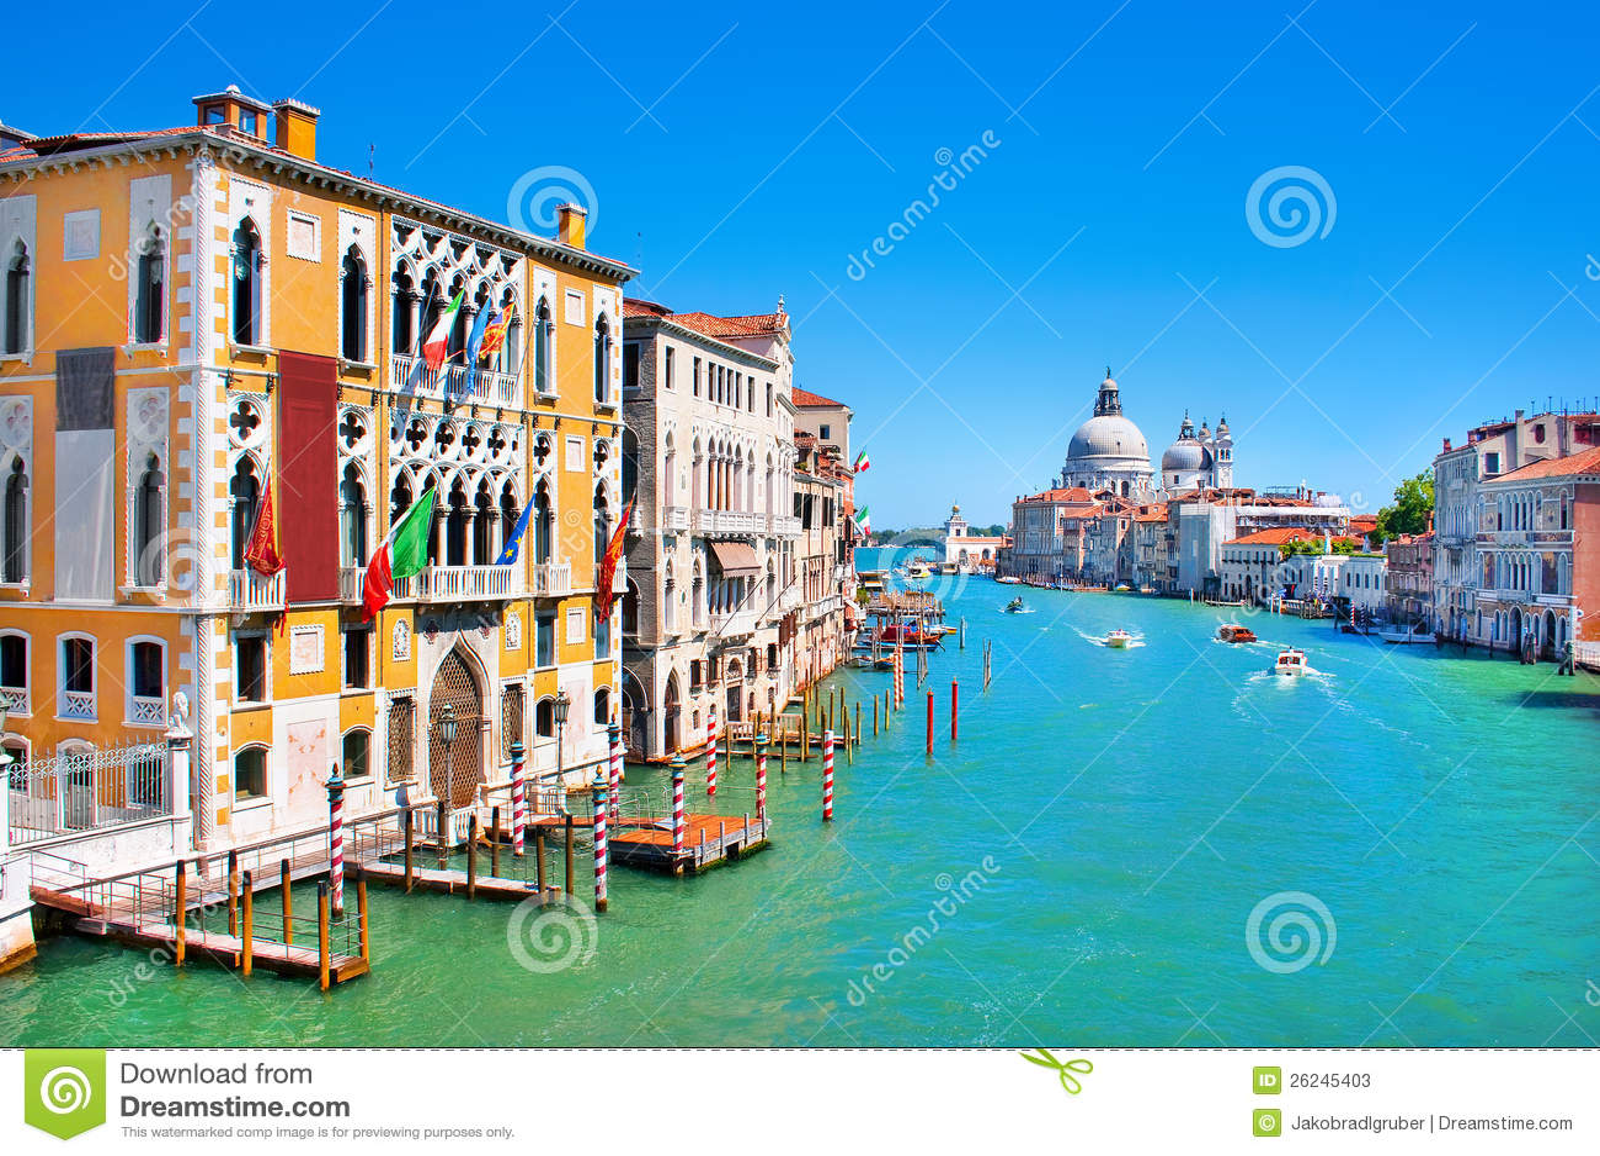 Canal grandioso em Veneza, Italy